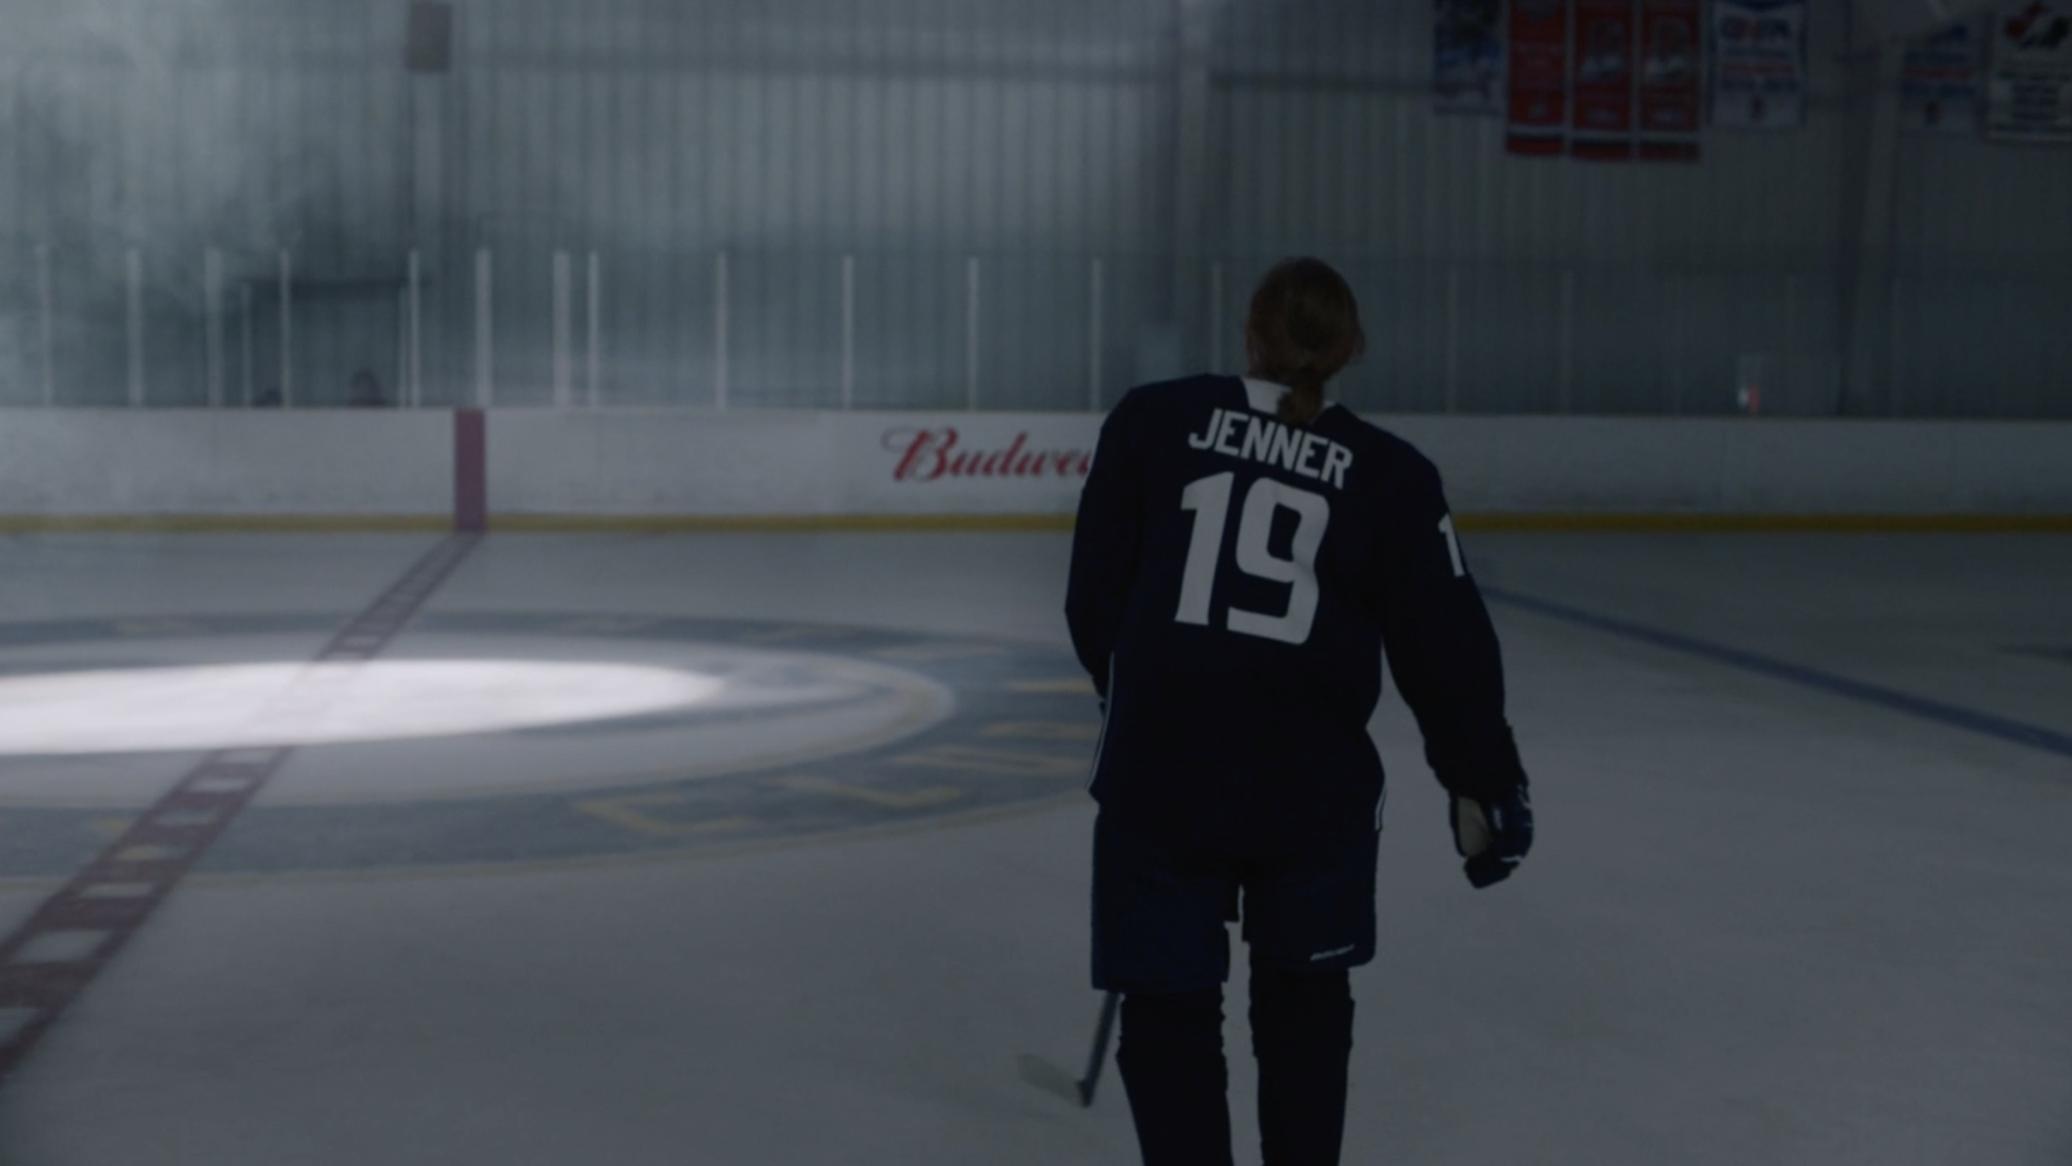 Thumbnail for The Good Ol' Hockey Game